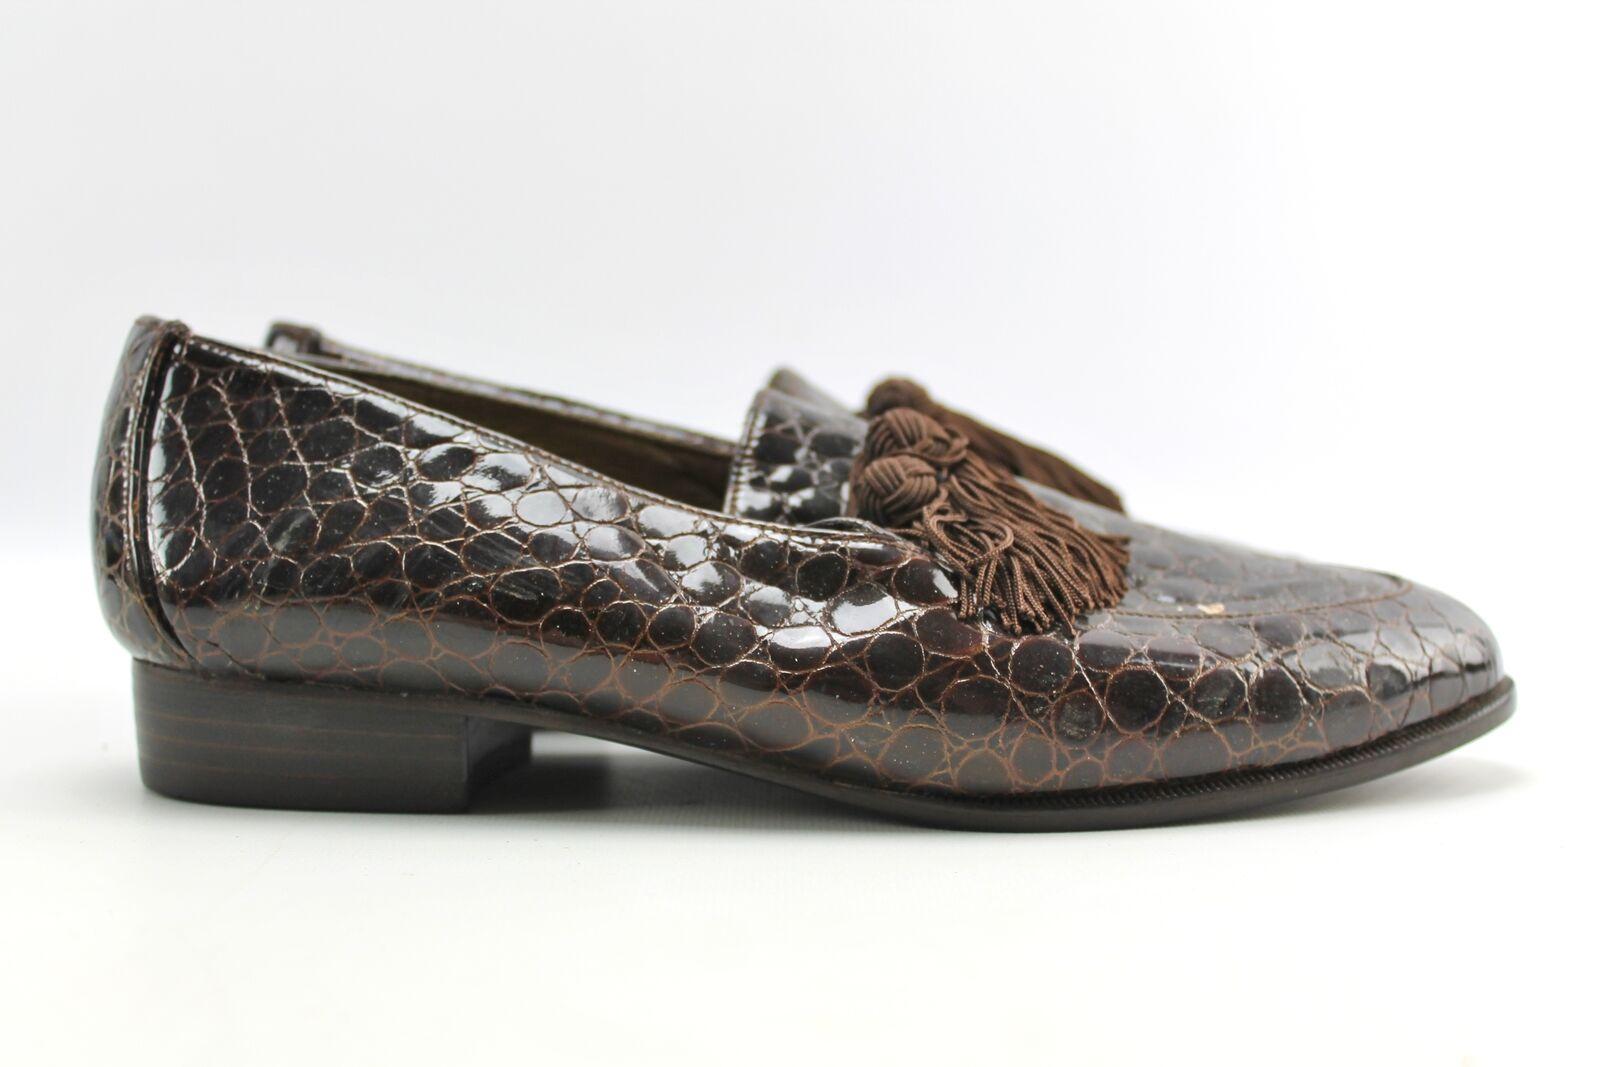 Stuart Weitzuomo Marronee Patent Croc Embossed Tassel Smore Loafer Flats sautope 7.5